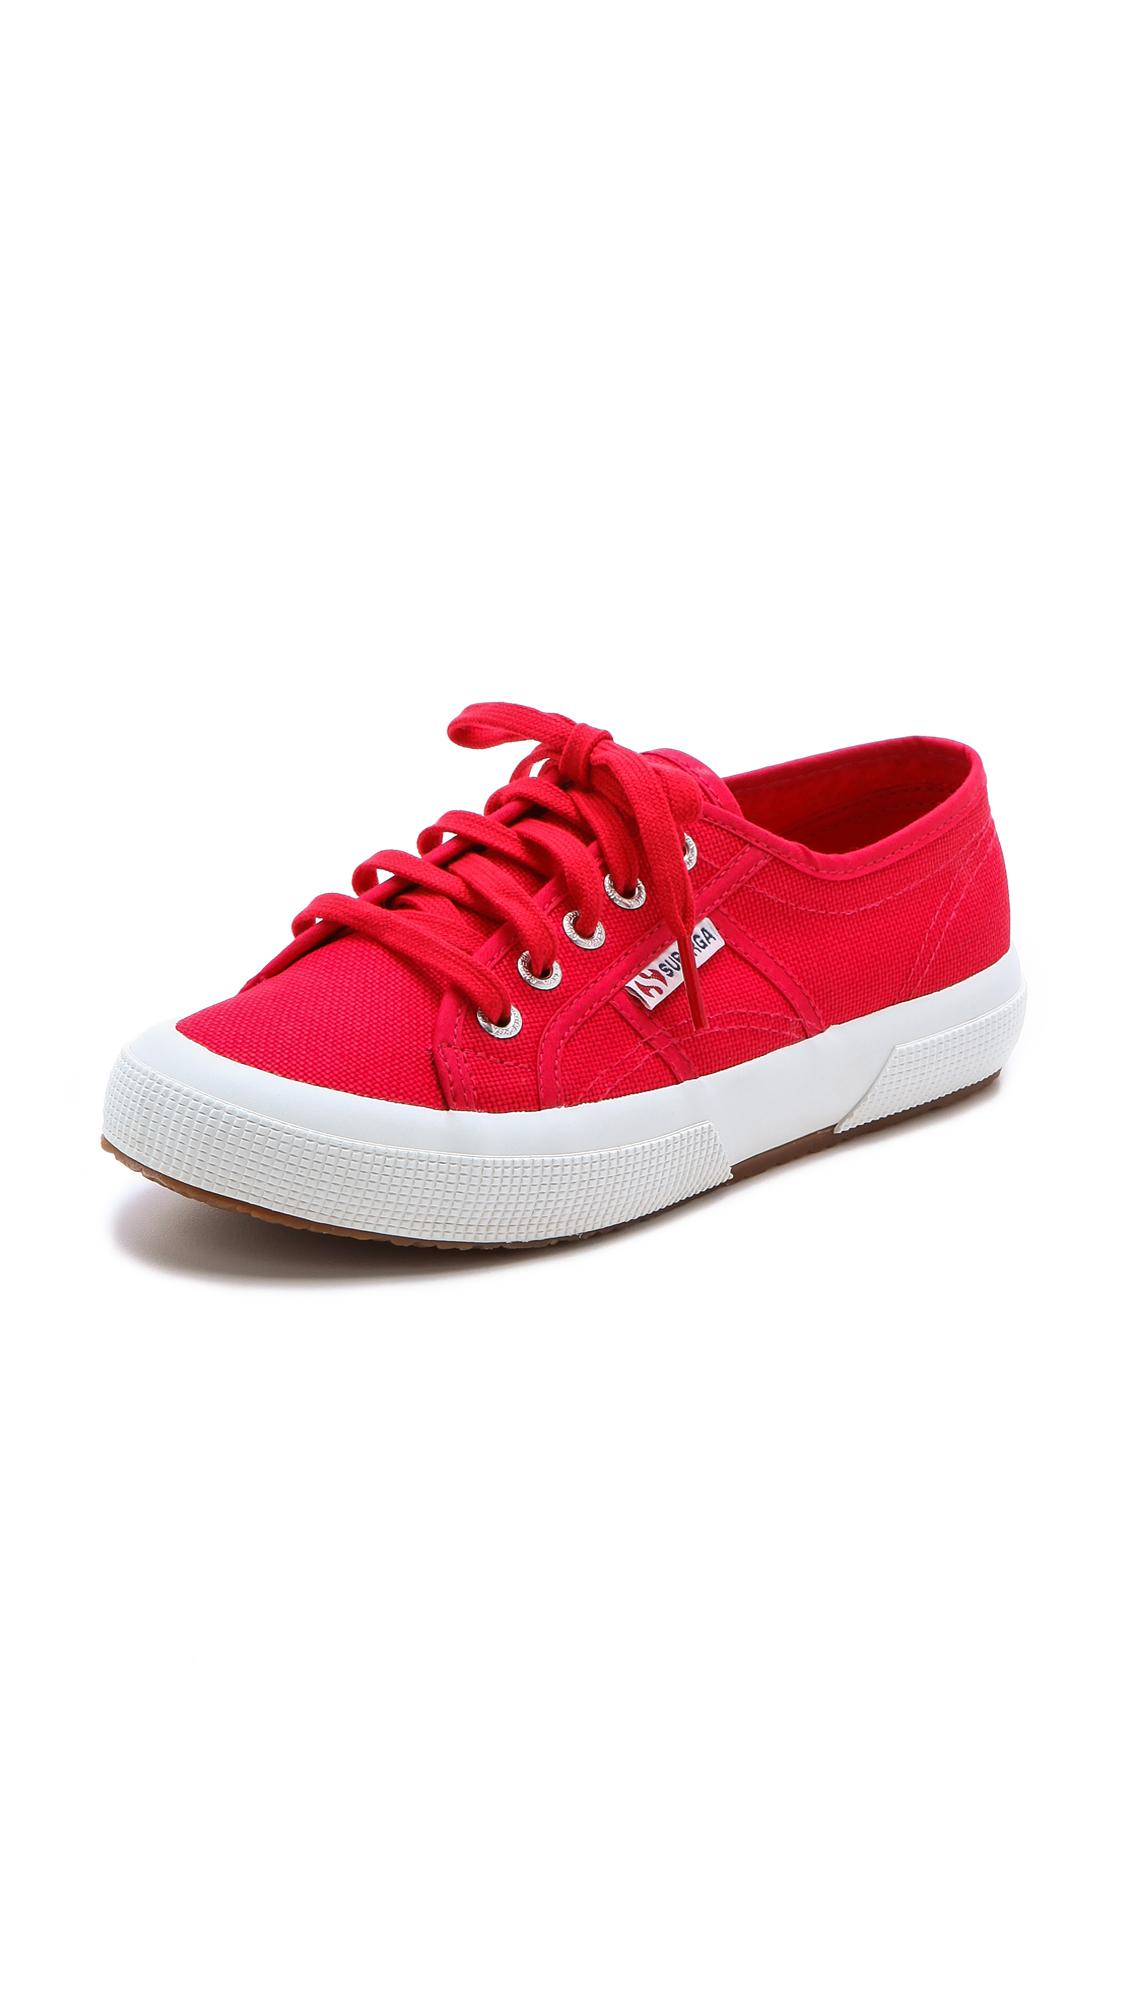 Photo of Superga 2750 Cotu Classic Sneakers Maroon Red - Superga online